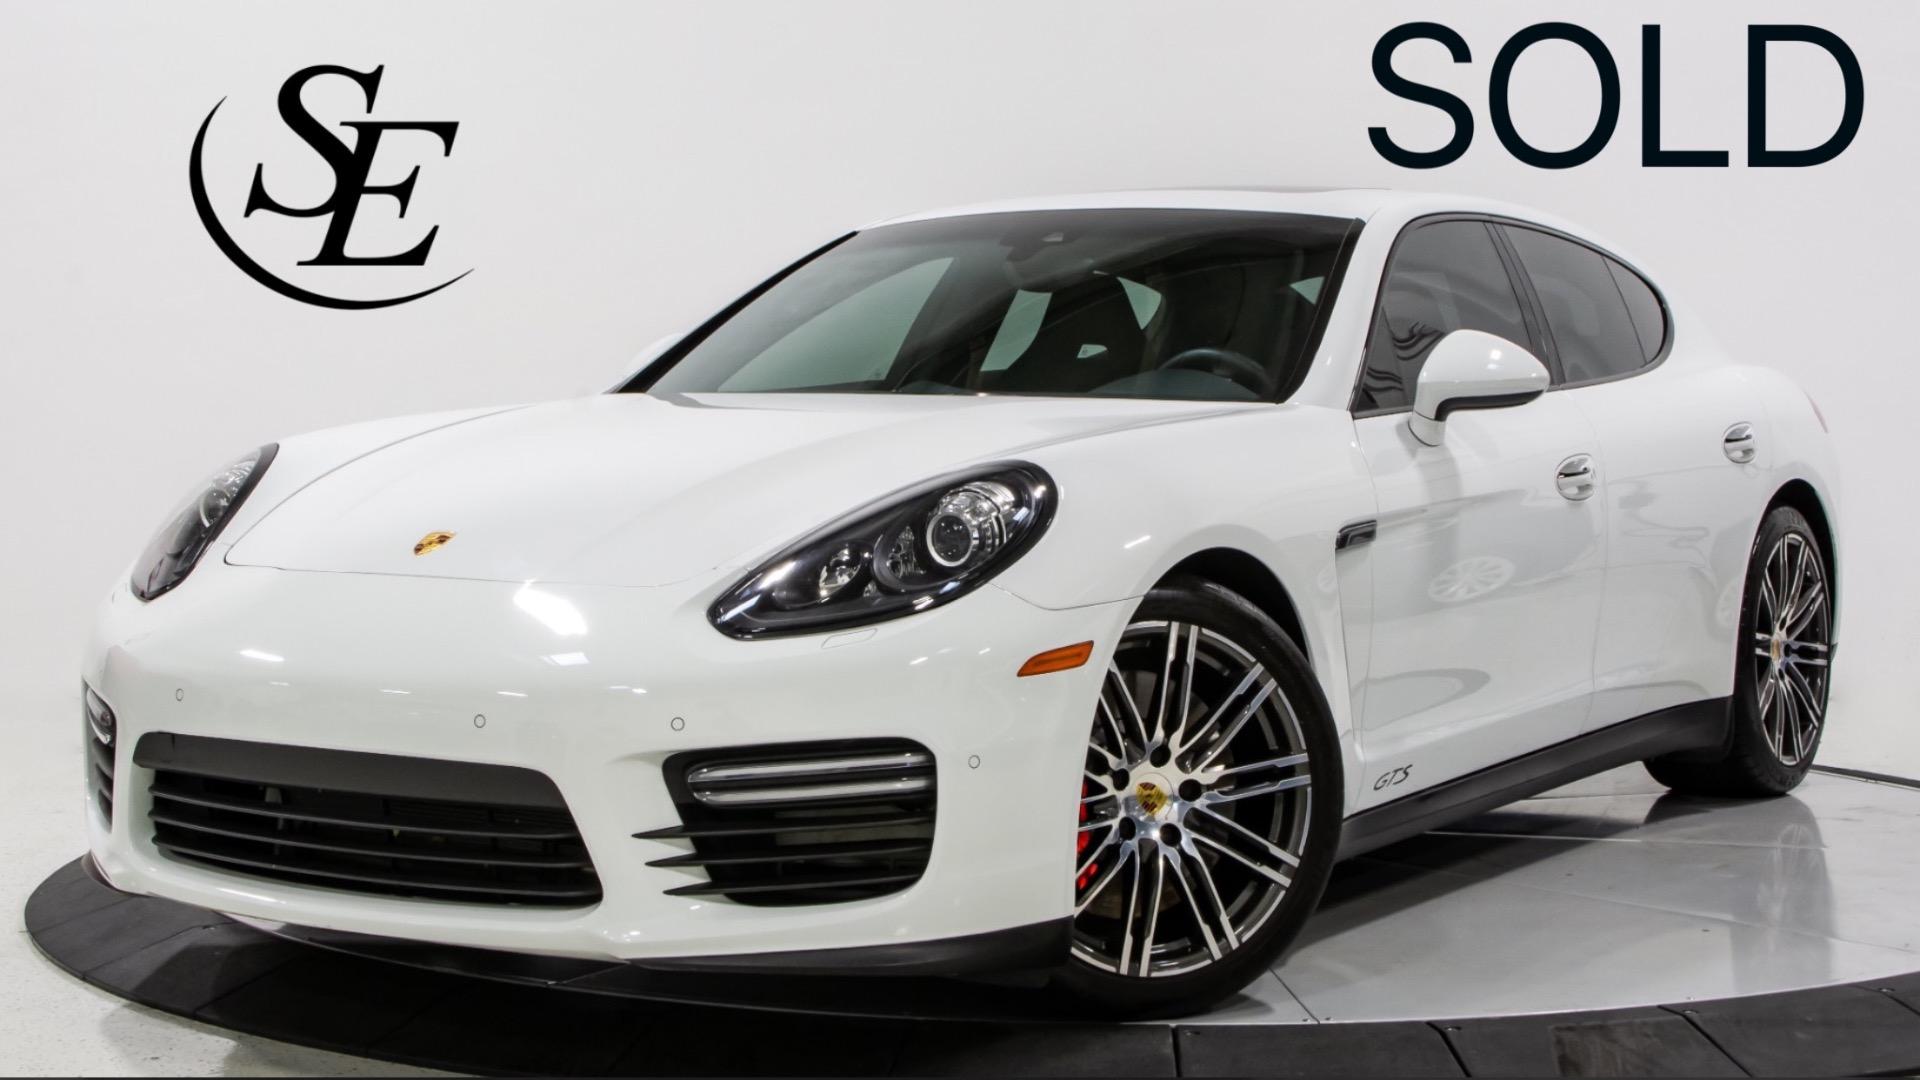 2016 Porsche Panamera Gts Stock 22686 For Sale Near Pompano Beach Fl Fl Porsche Dealer